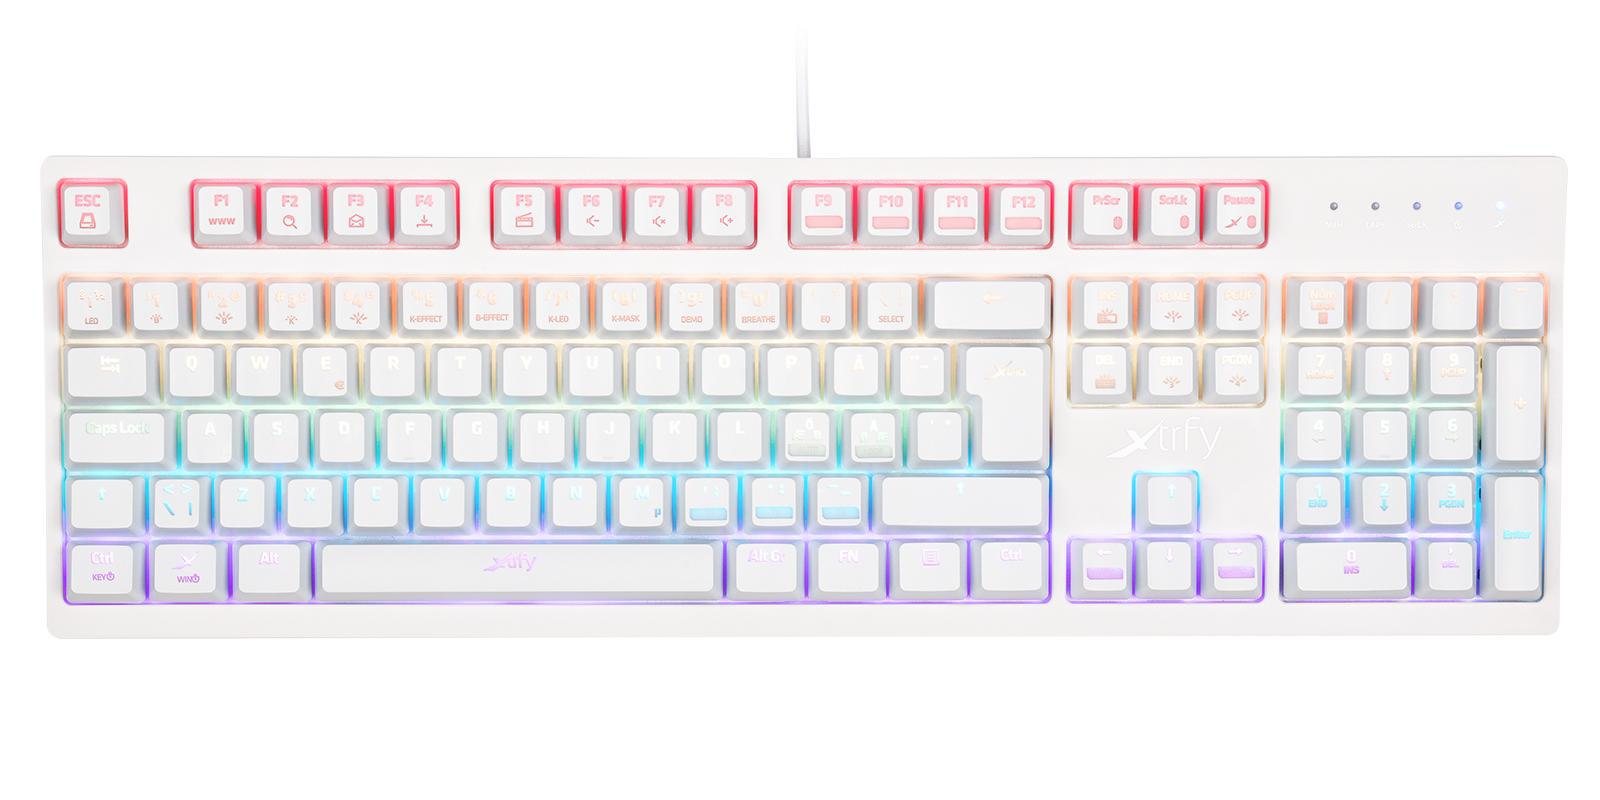 2-RGBホワイト 英語配列 赤軸メカニカル ゲーミングキーボード 1,680万色LEDイルミネーション(各キー設定可) UK配列2